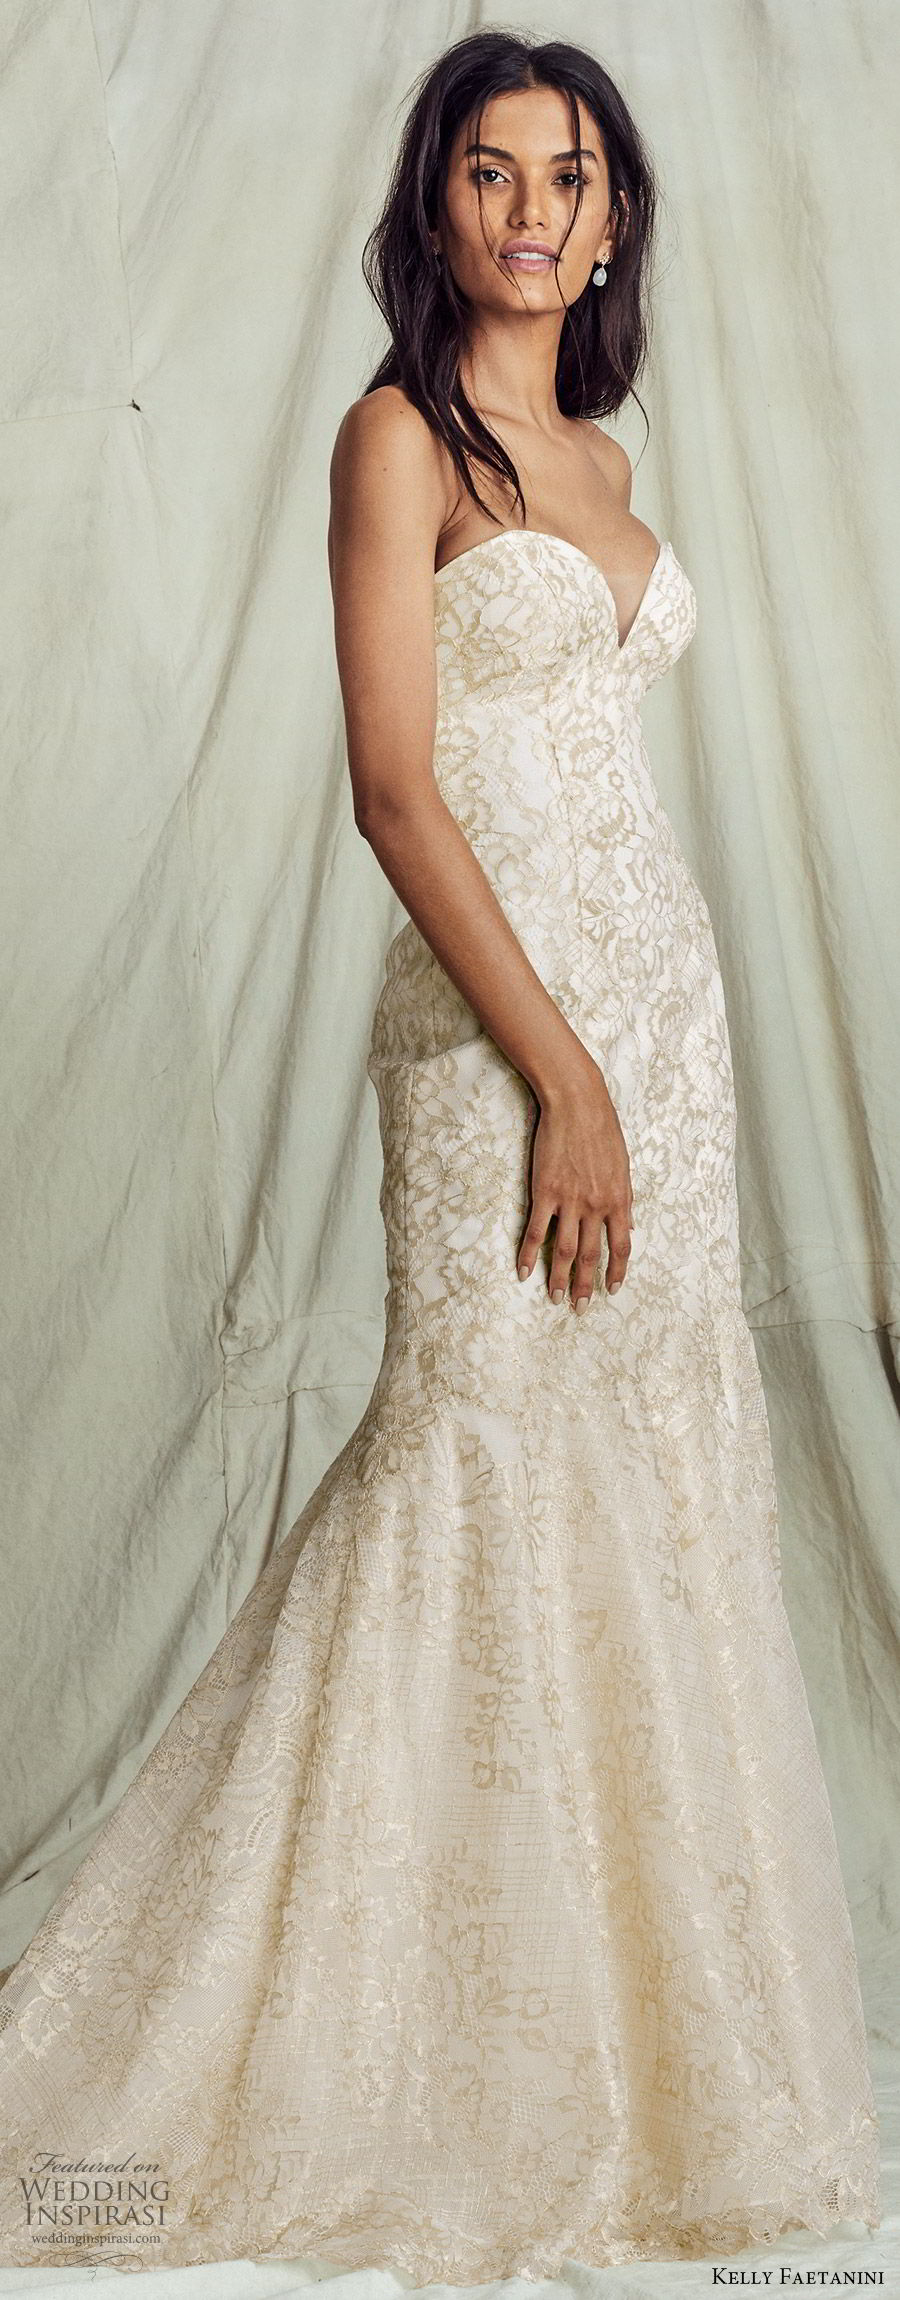 kelly faetanini fall 2019 bridal strapless sweetheart trumpet mermaid lace wedding dress chapel train gold color romantic elegant  (13) mv